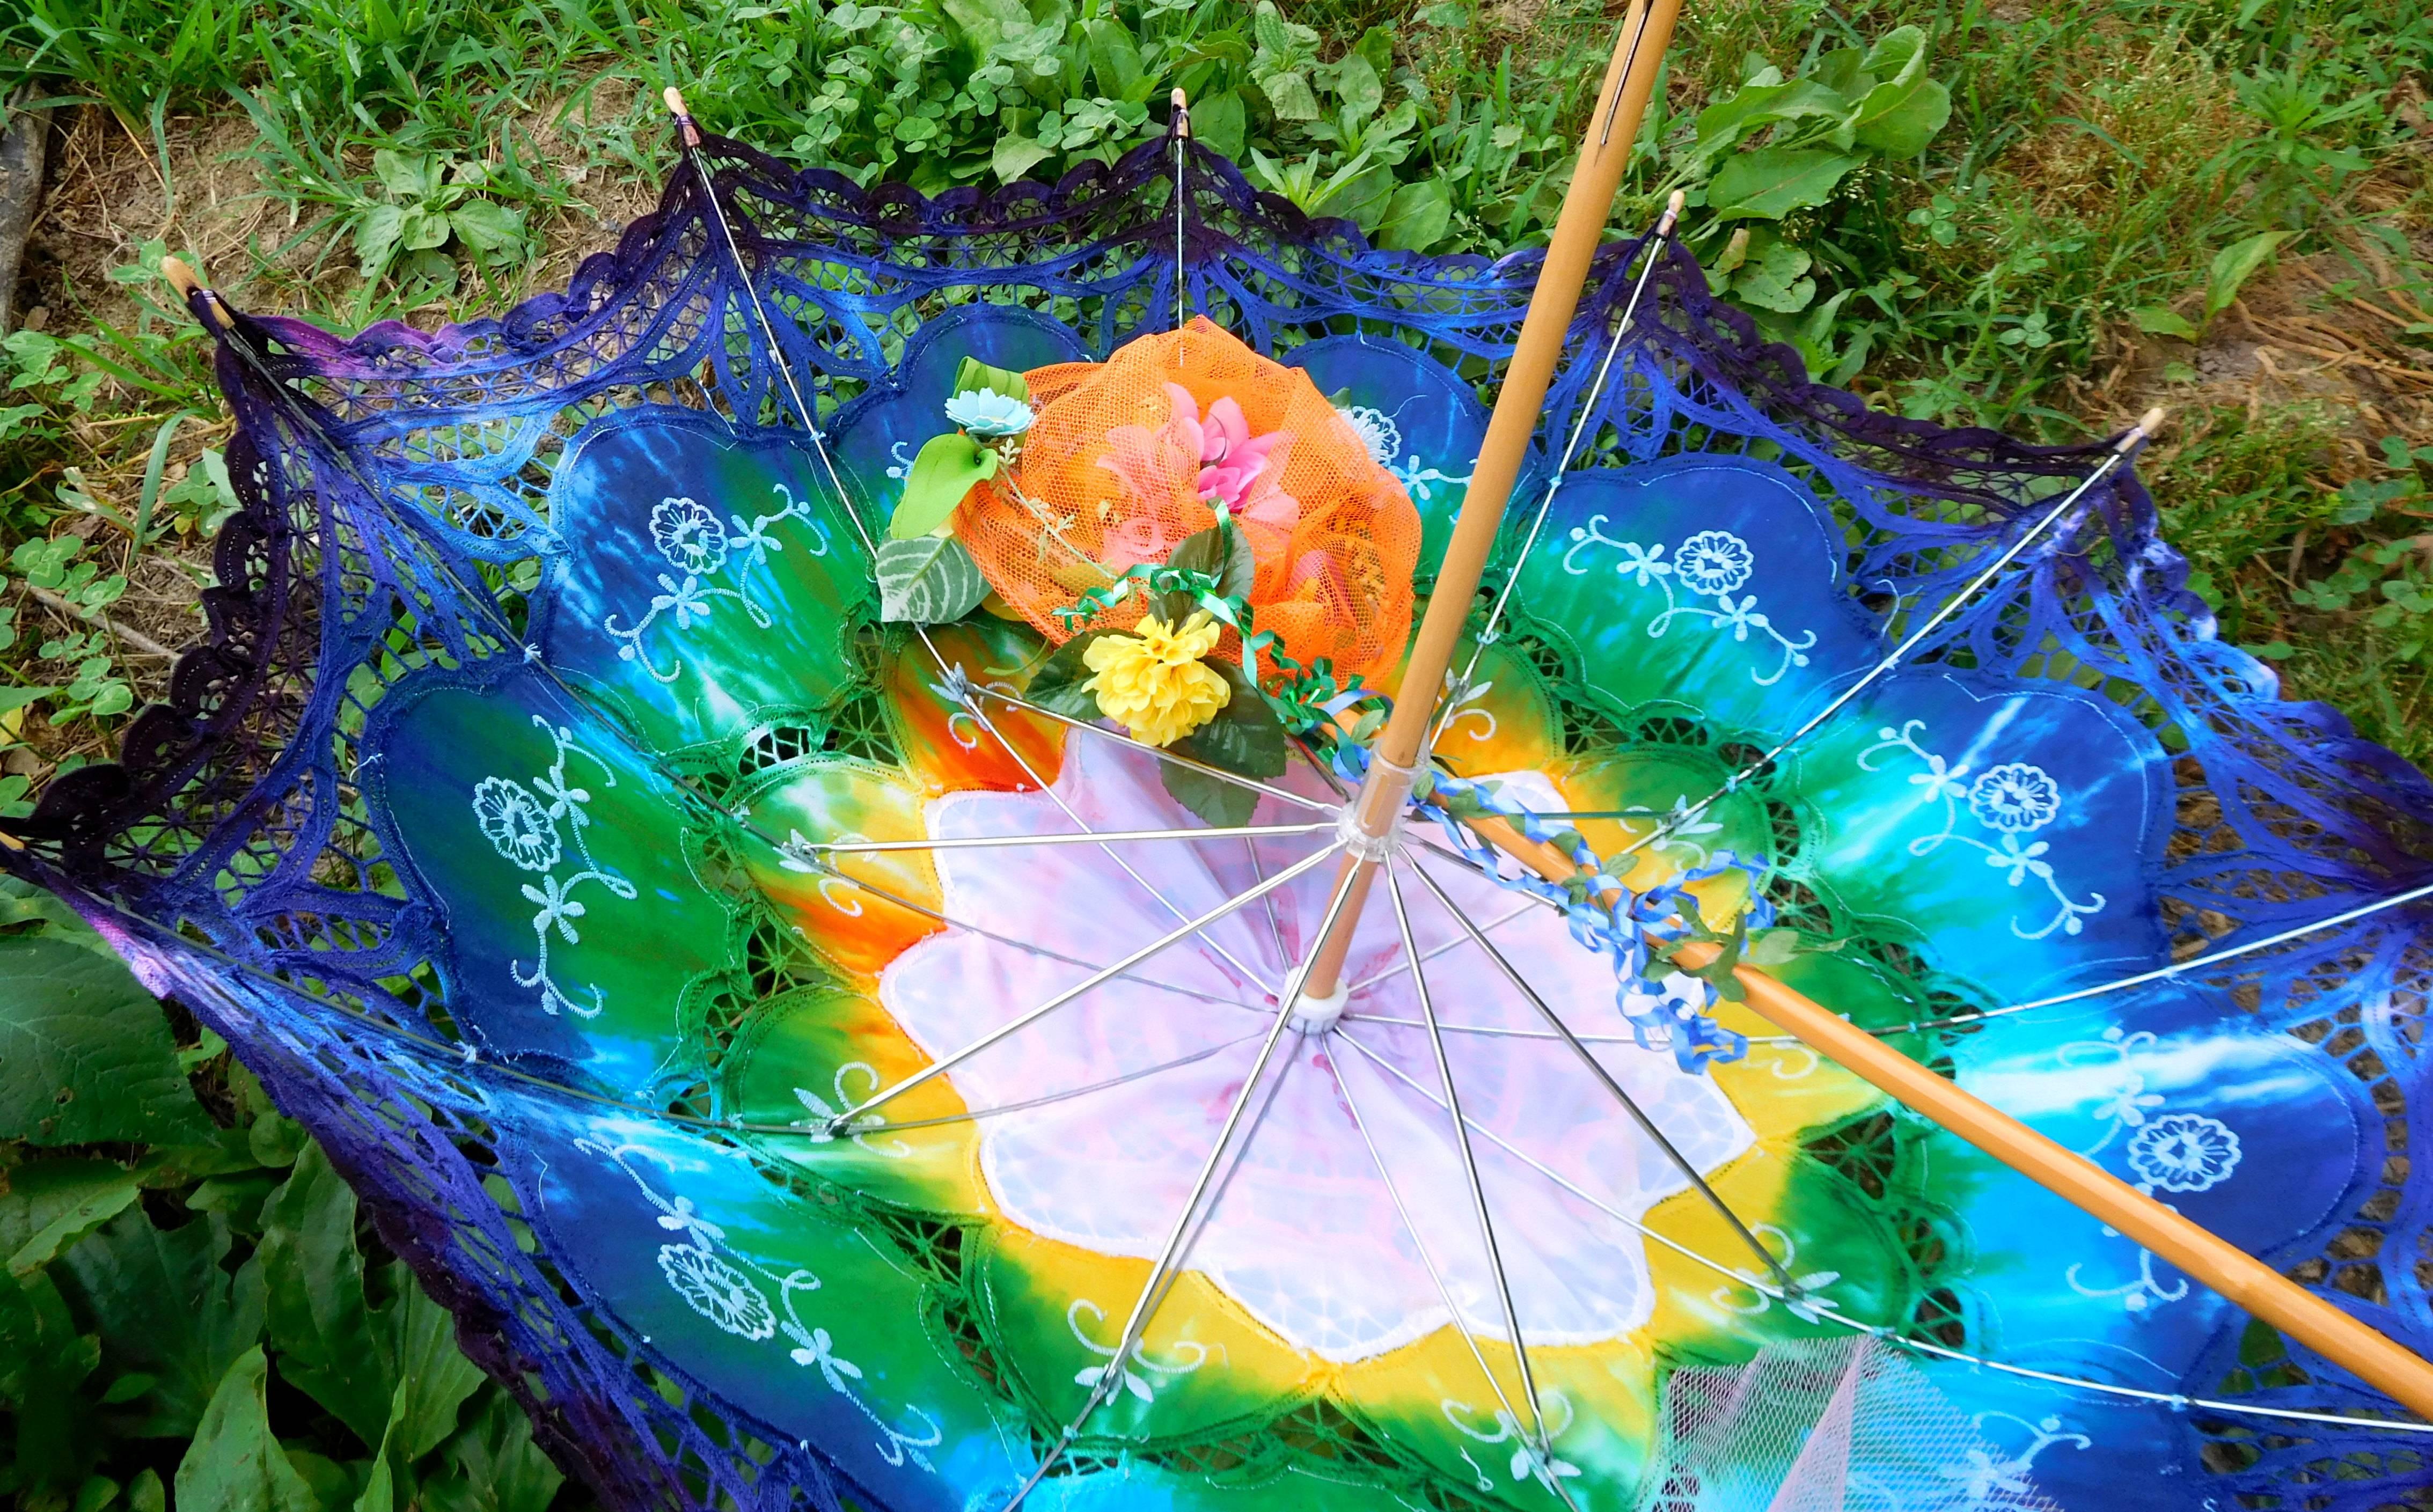 Posie's Magical Parasol